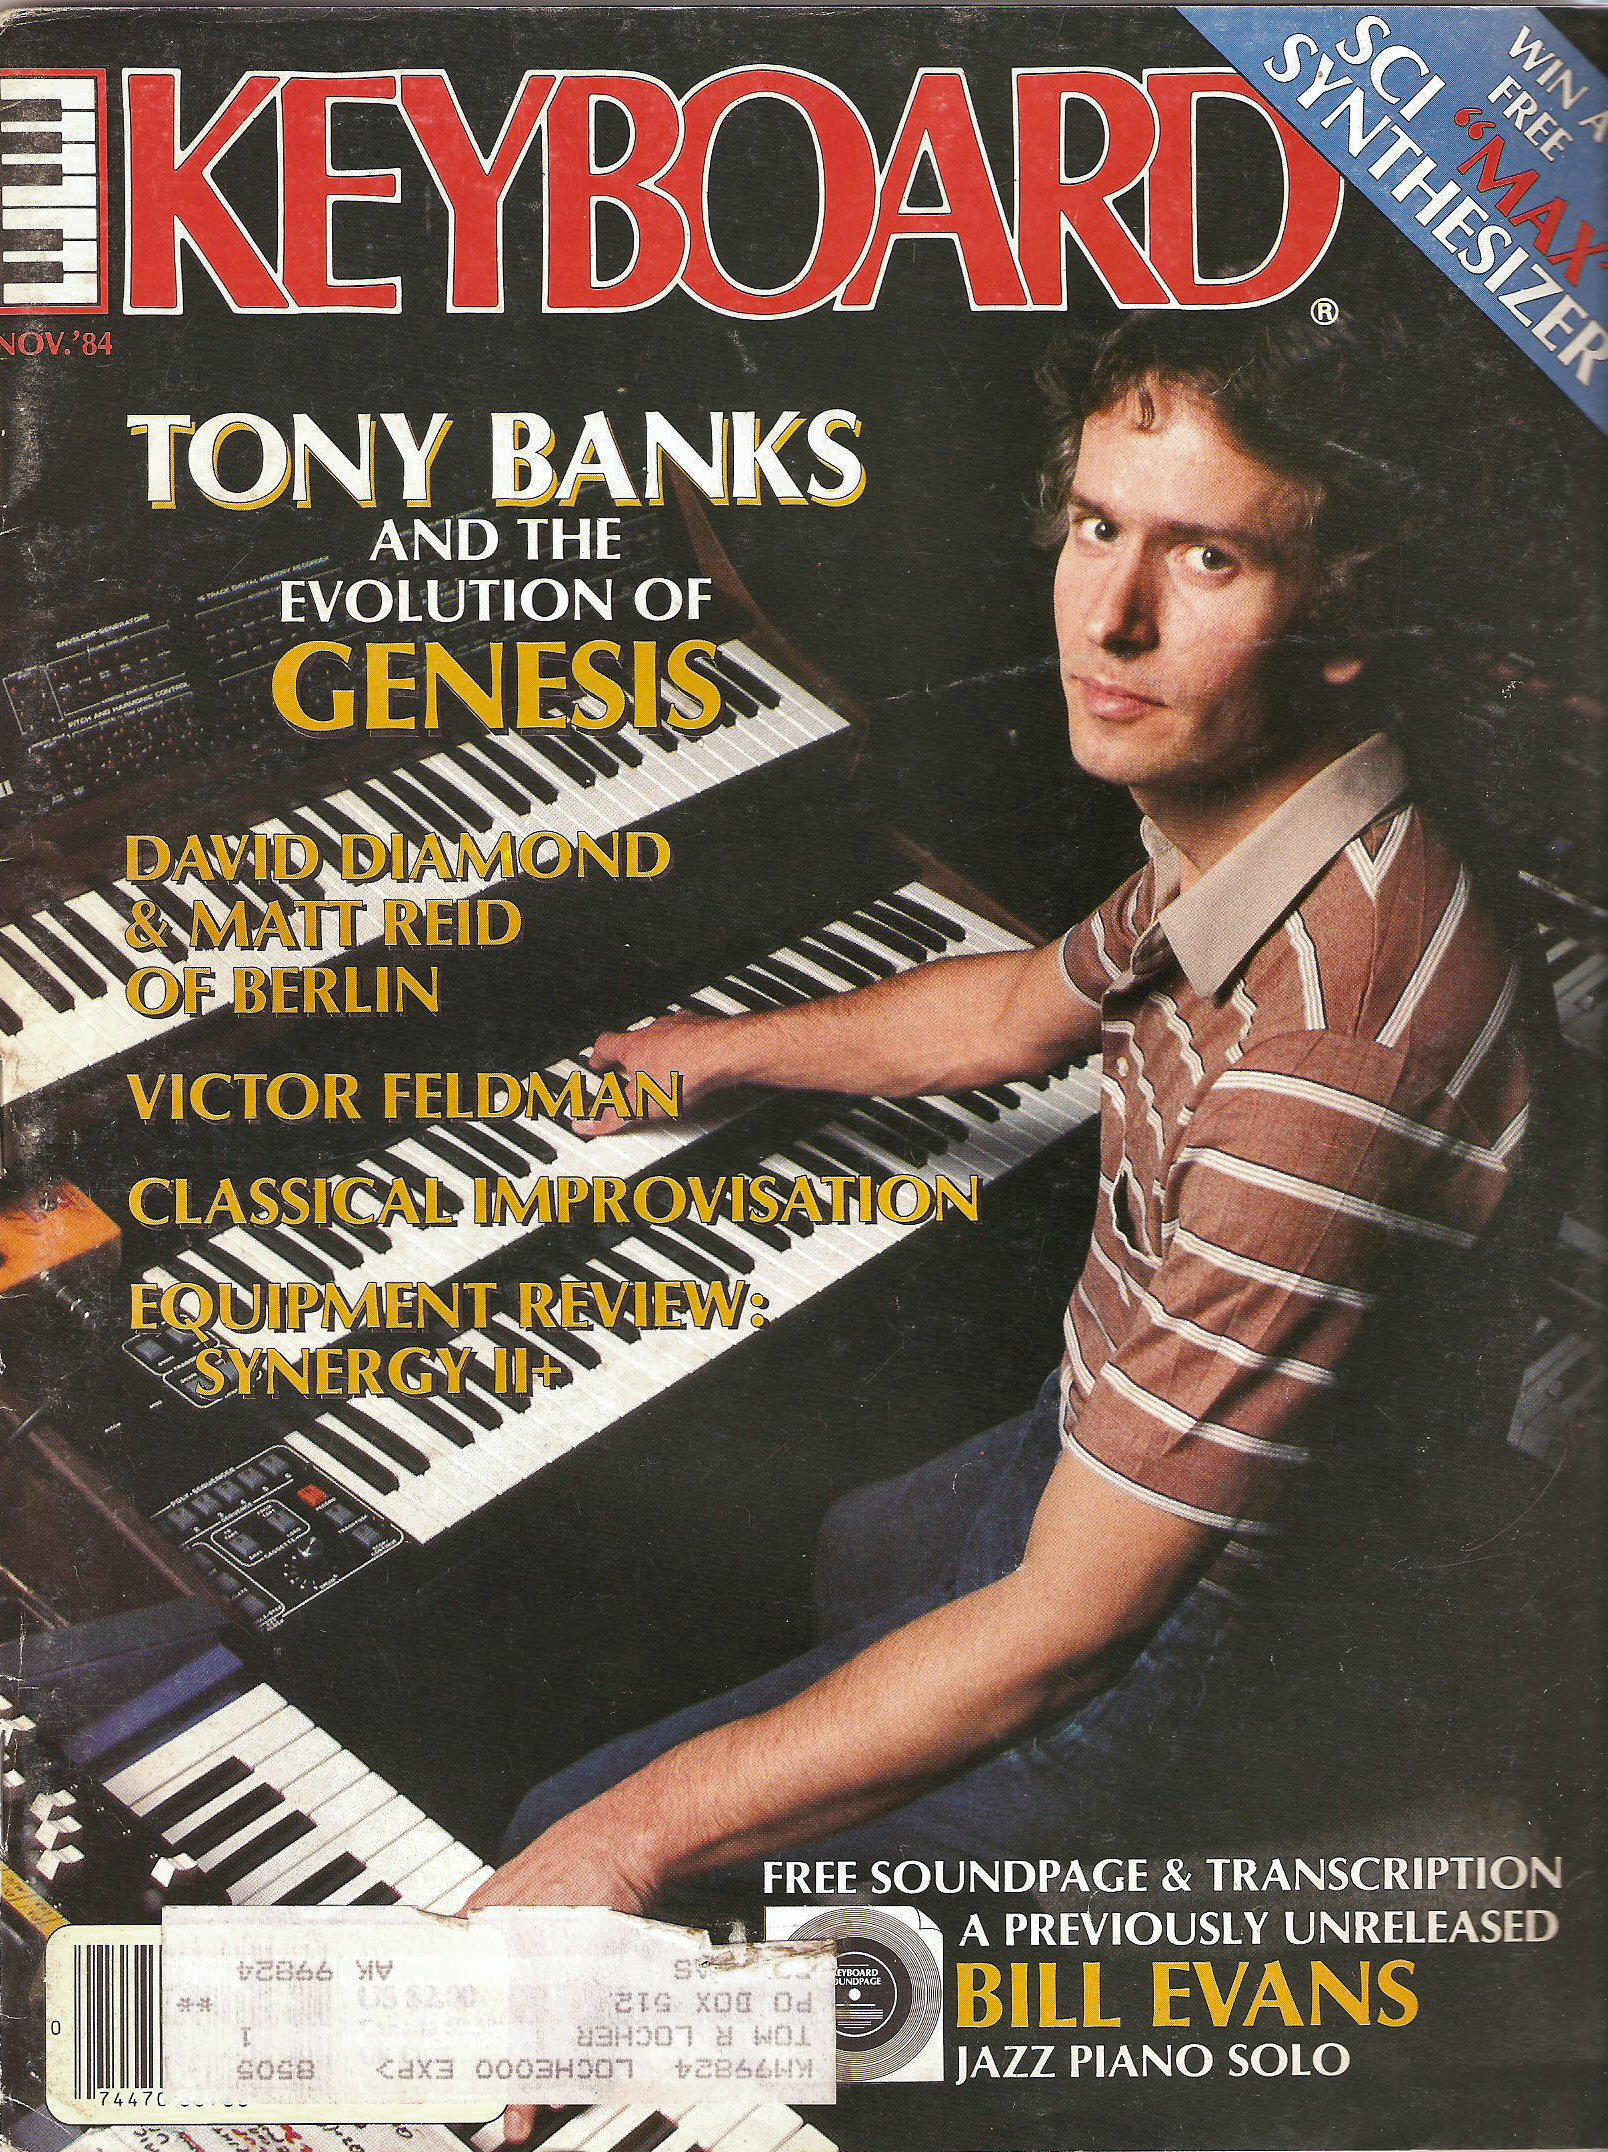 Keyboard Magazine November 1984 Tony Banks Feature The